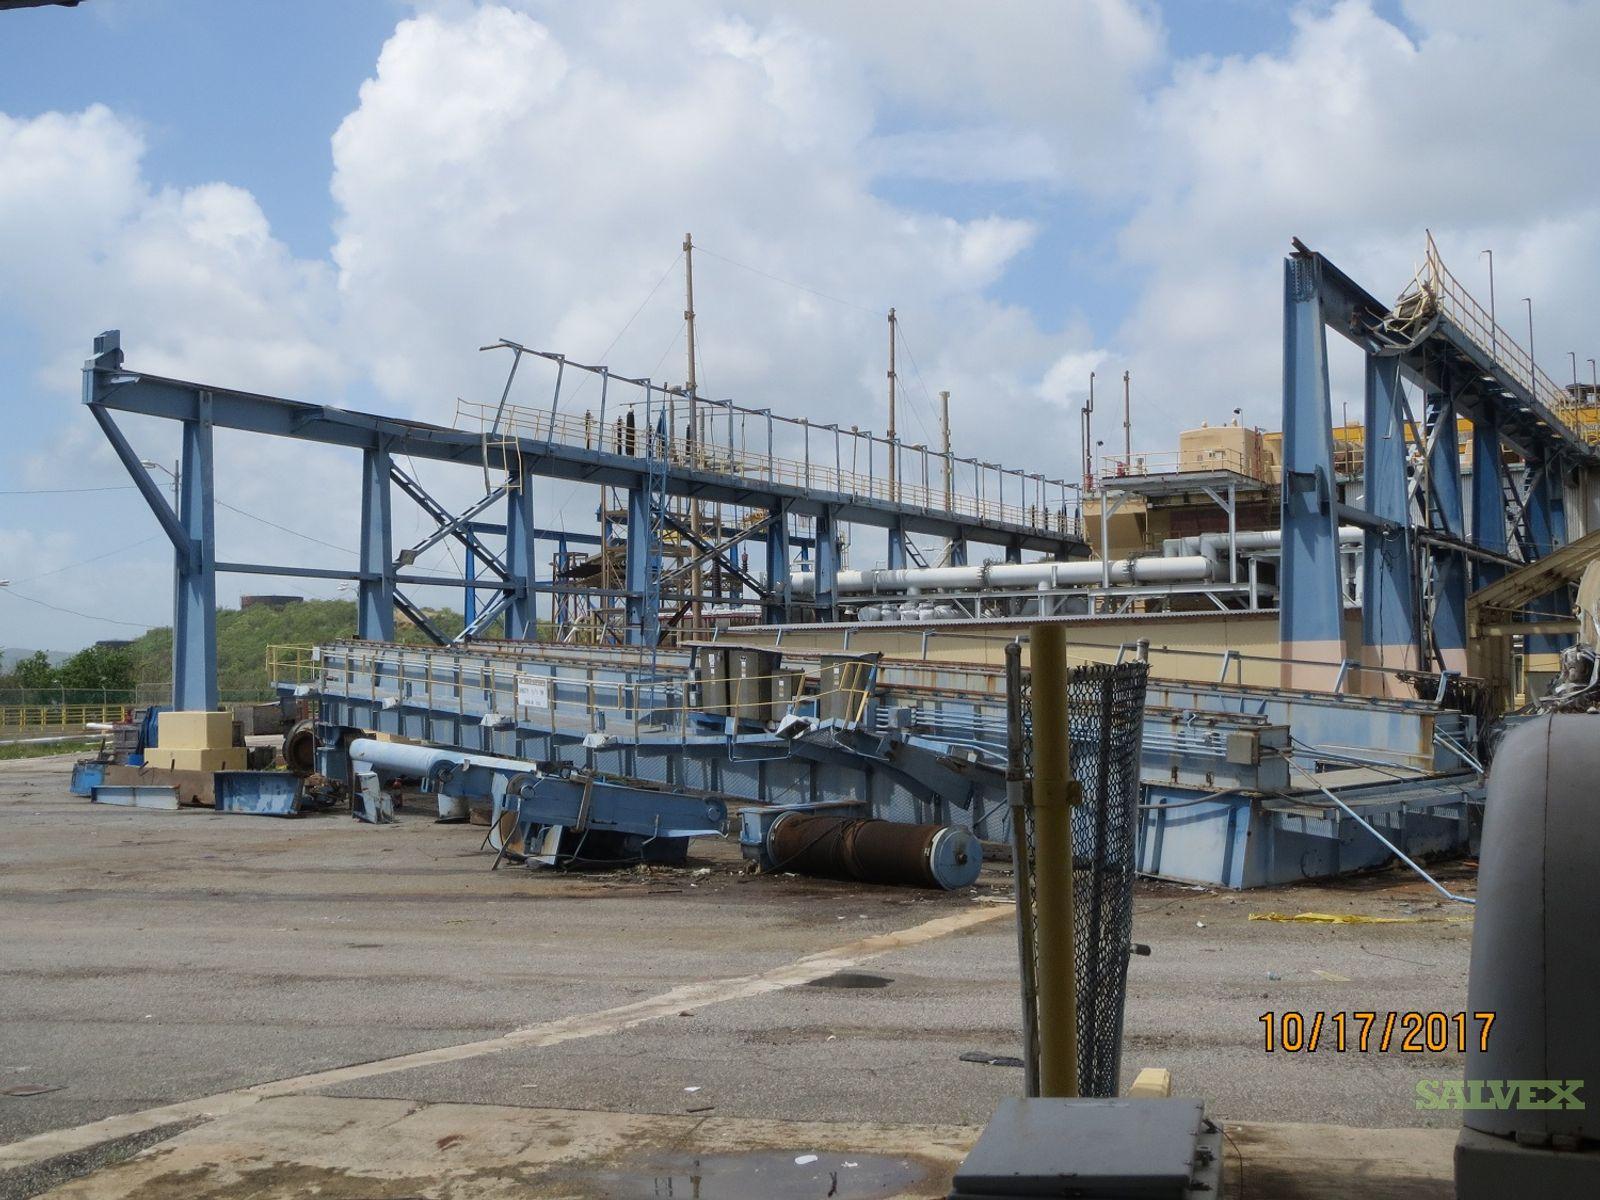 Scrap Overhead Crane with Electric Motors 90/15 Tons Capacity (1 Unit)